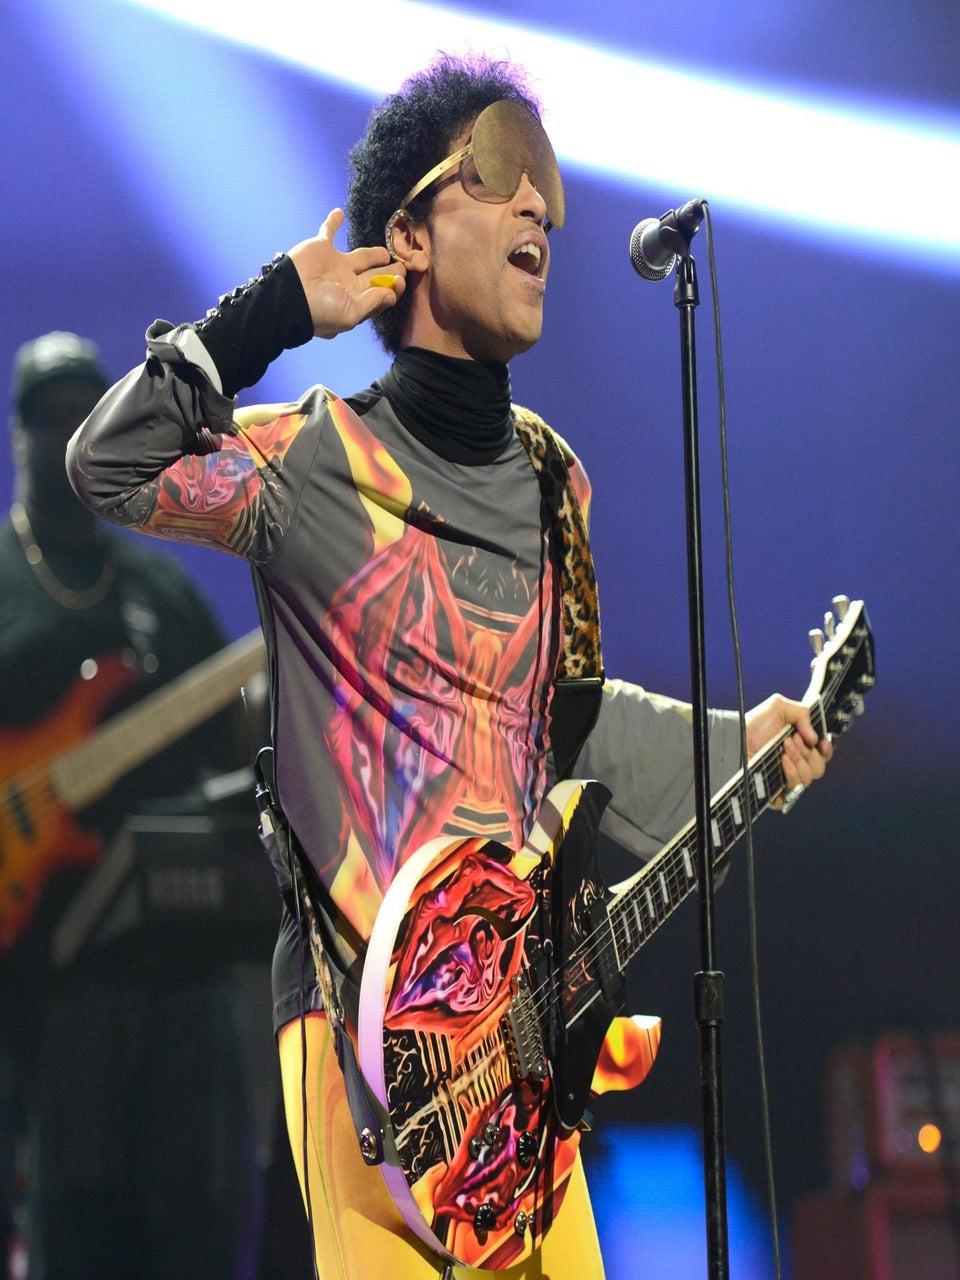 Beyonce, Prince, Jay Z to Headline Tidal Charity Concert